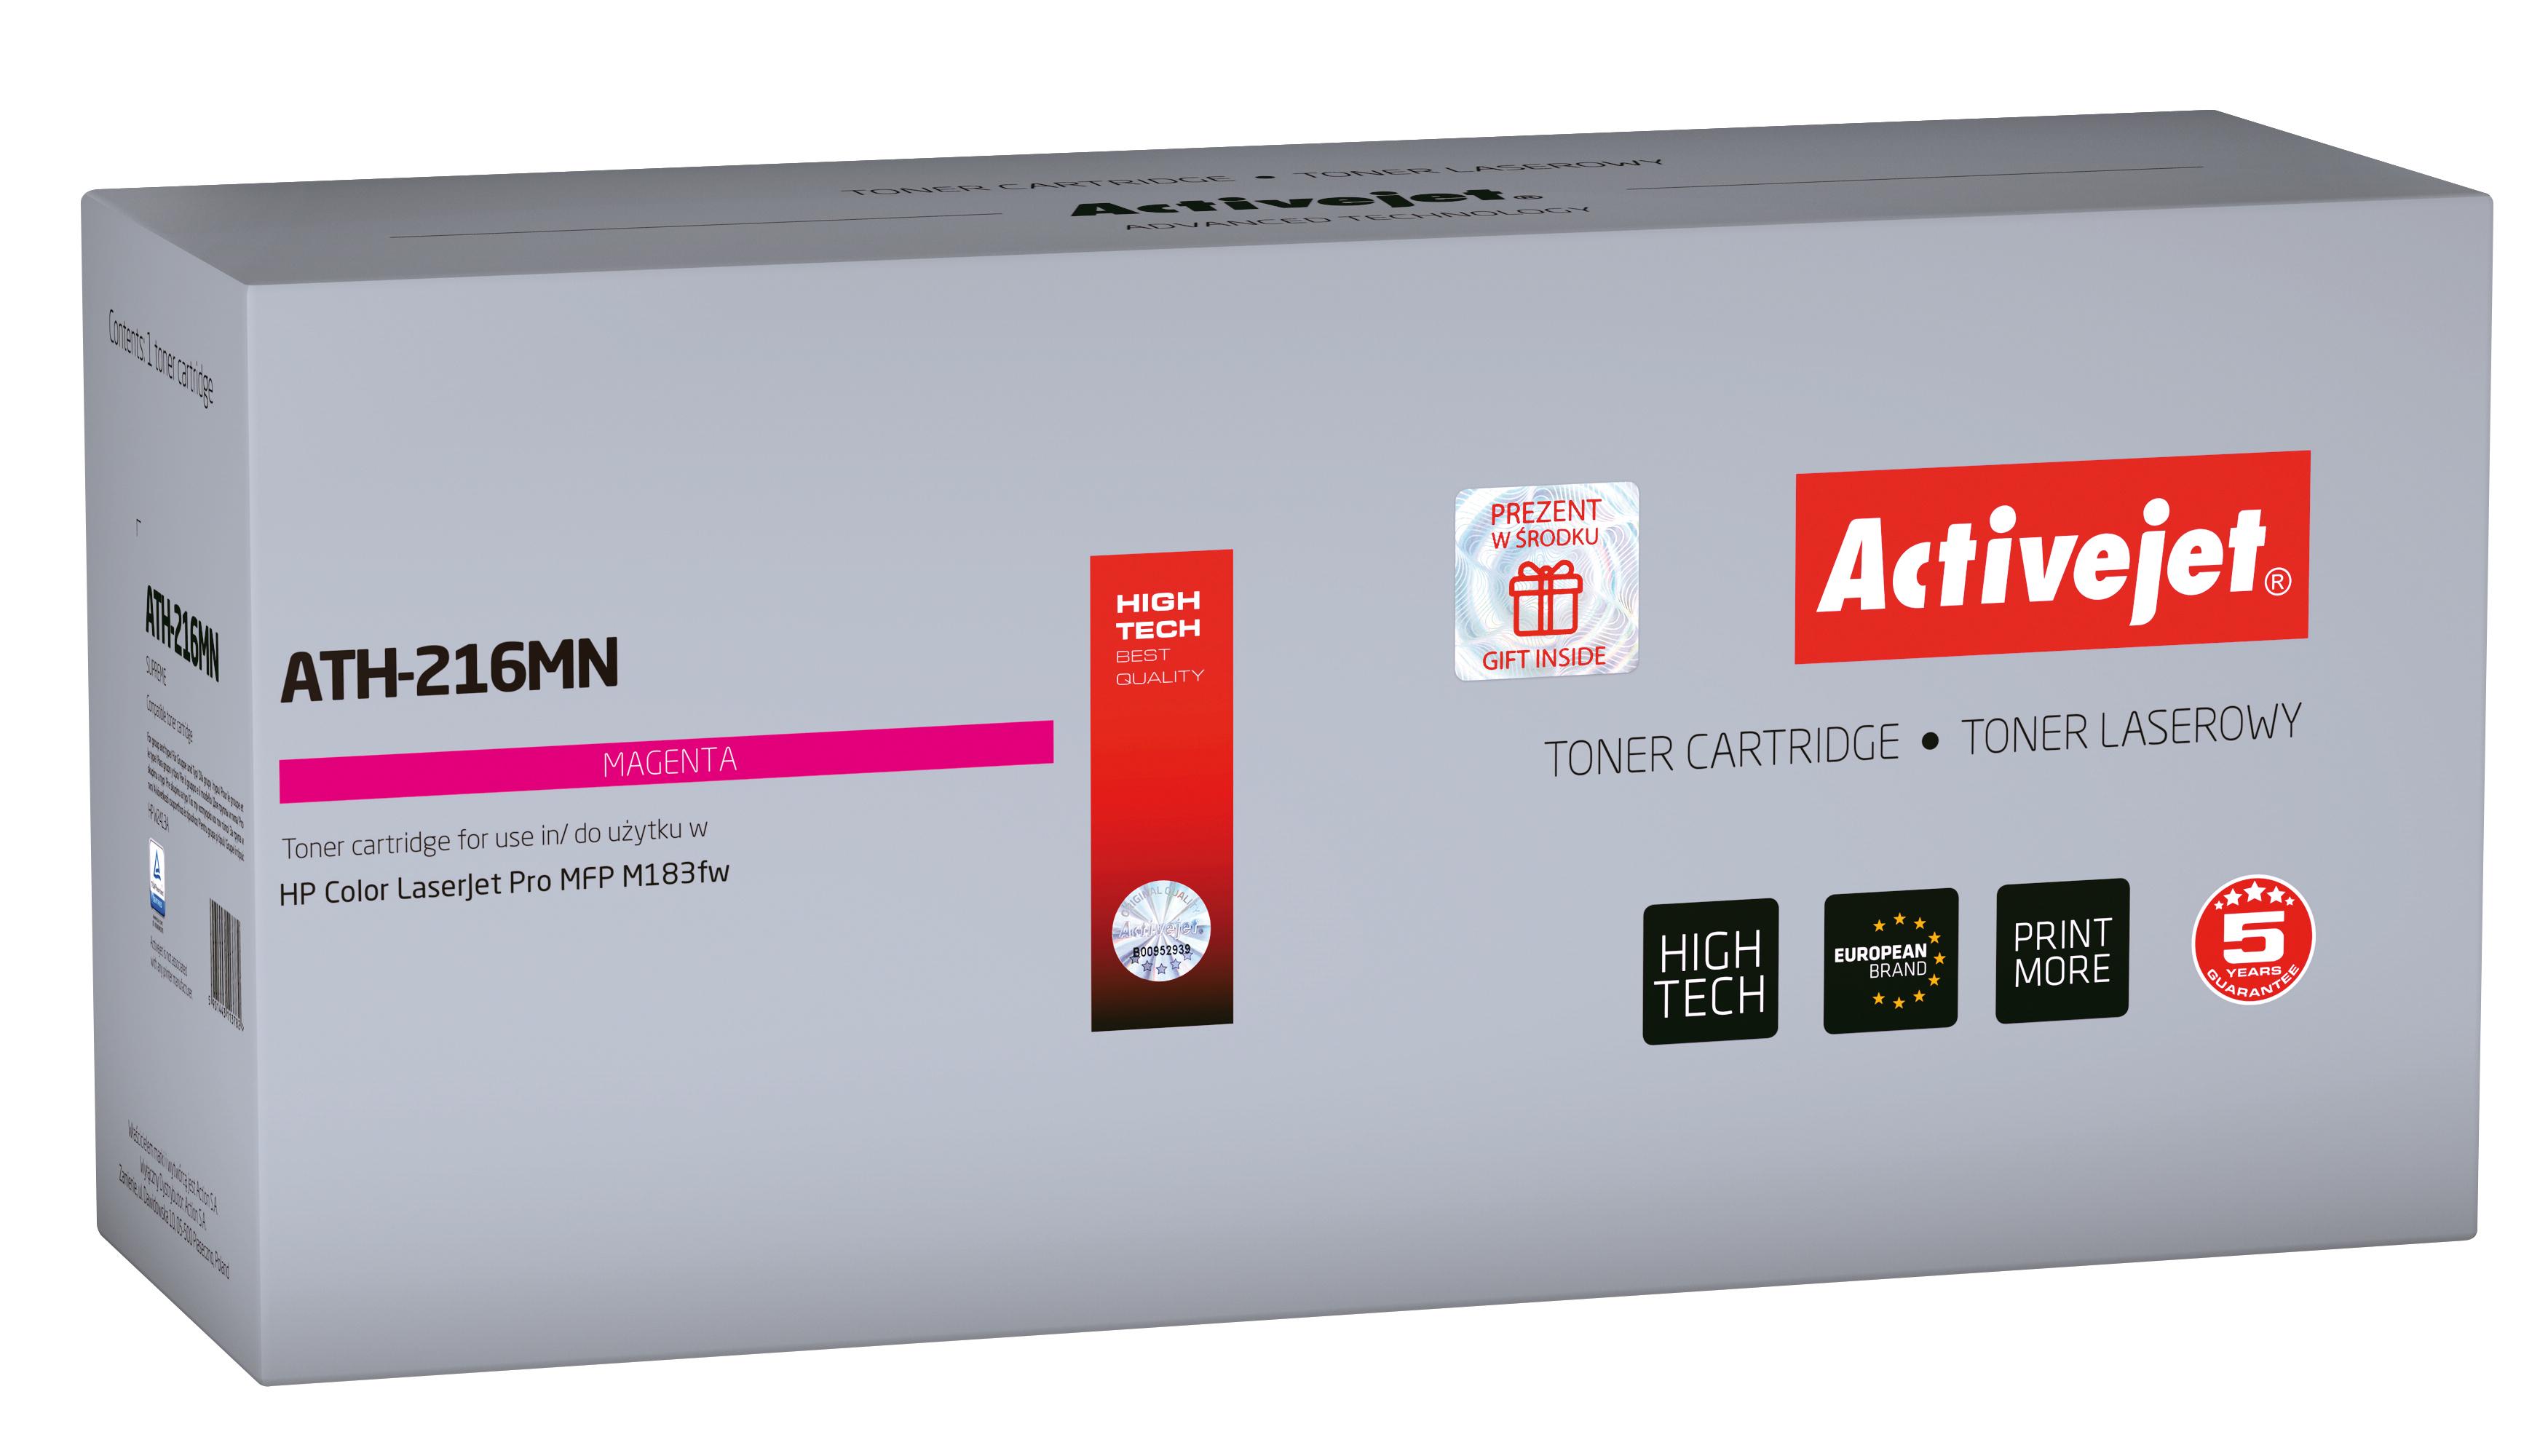 Toner Activejet  ATH-216MN do drukarki HP, Zamiennik HP 216A W2413A; Supreme; 850 stron; Purpurowy. Brak chipa